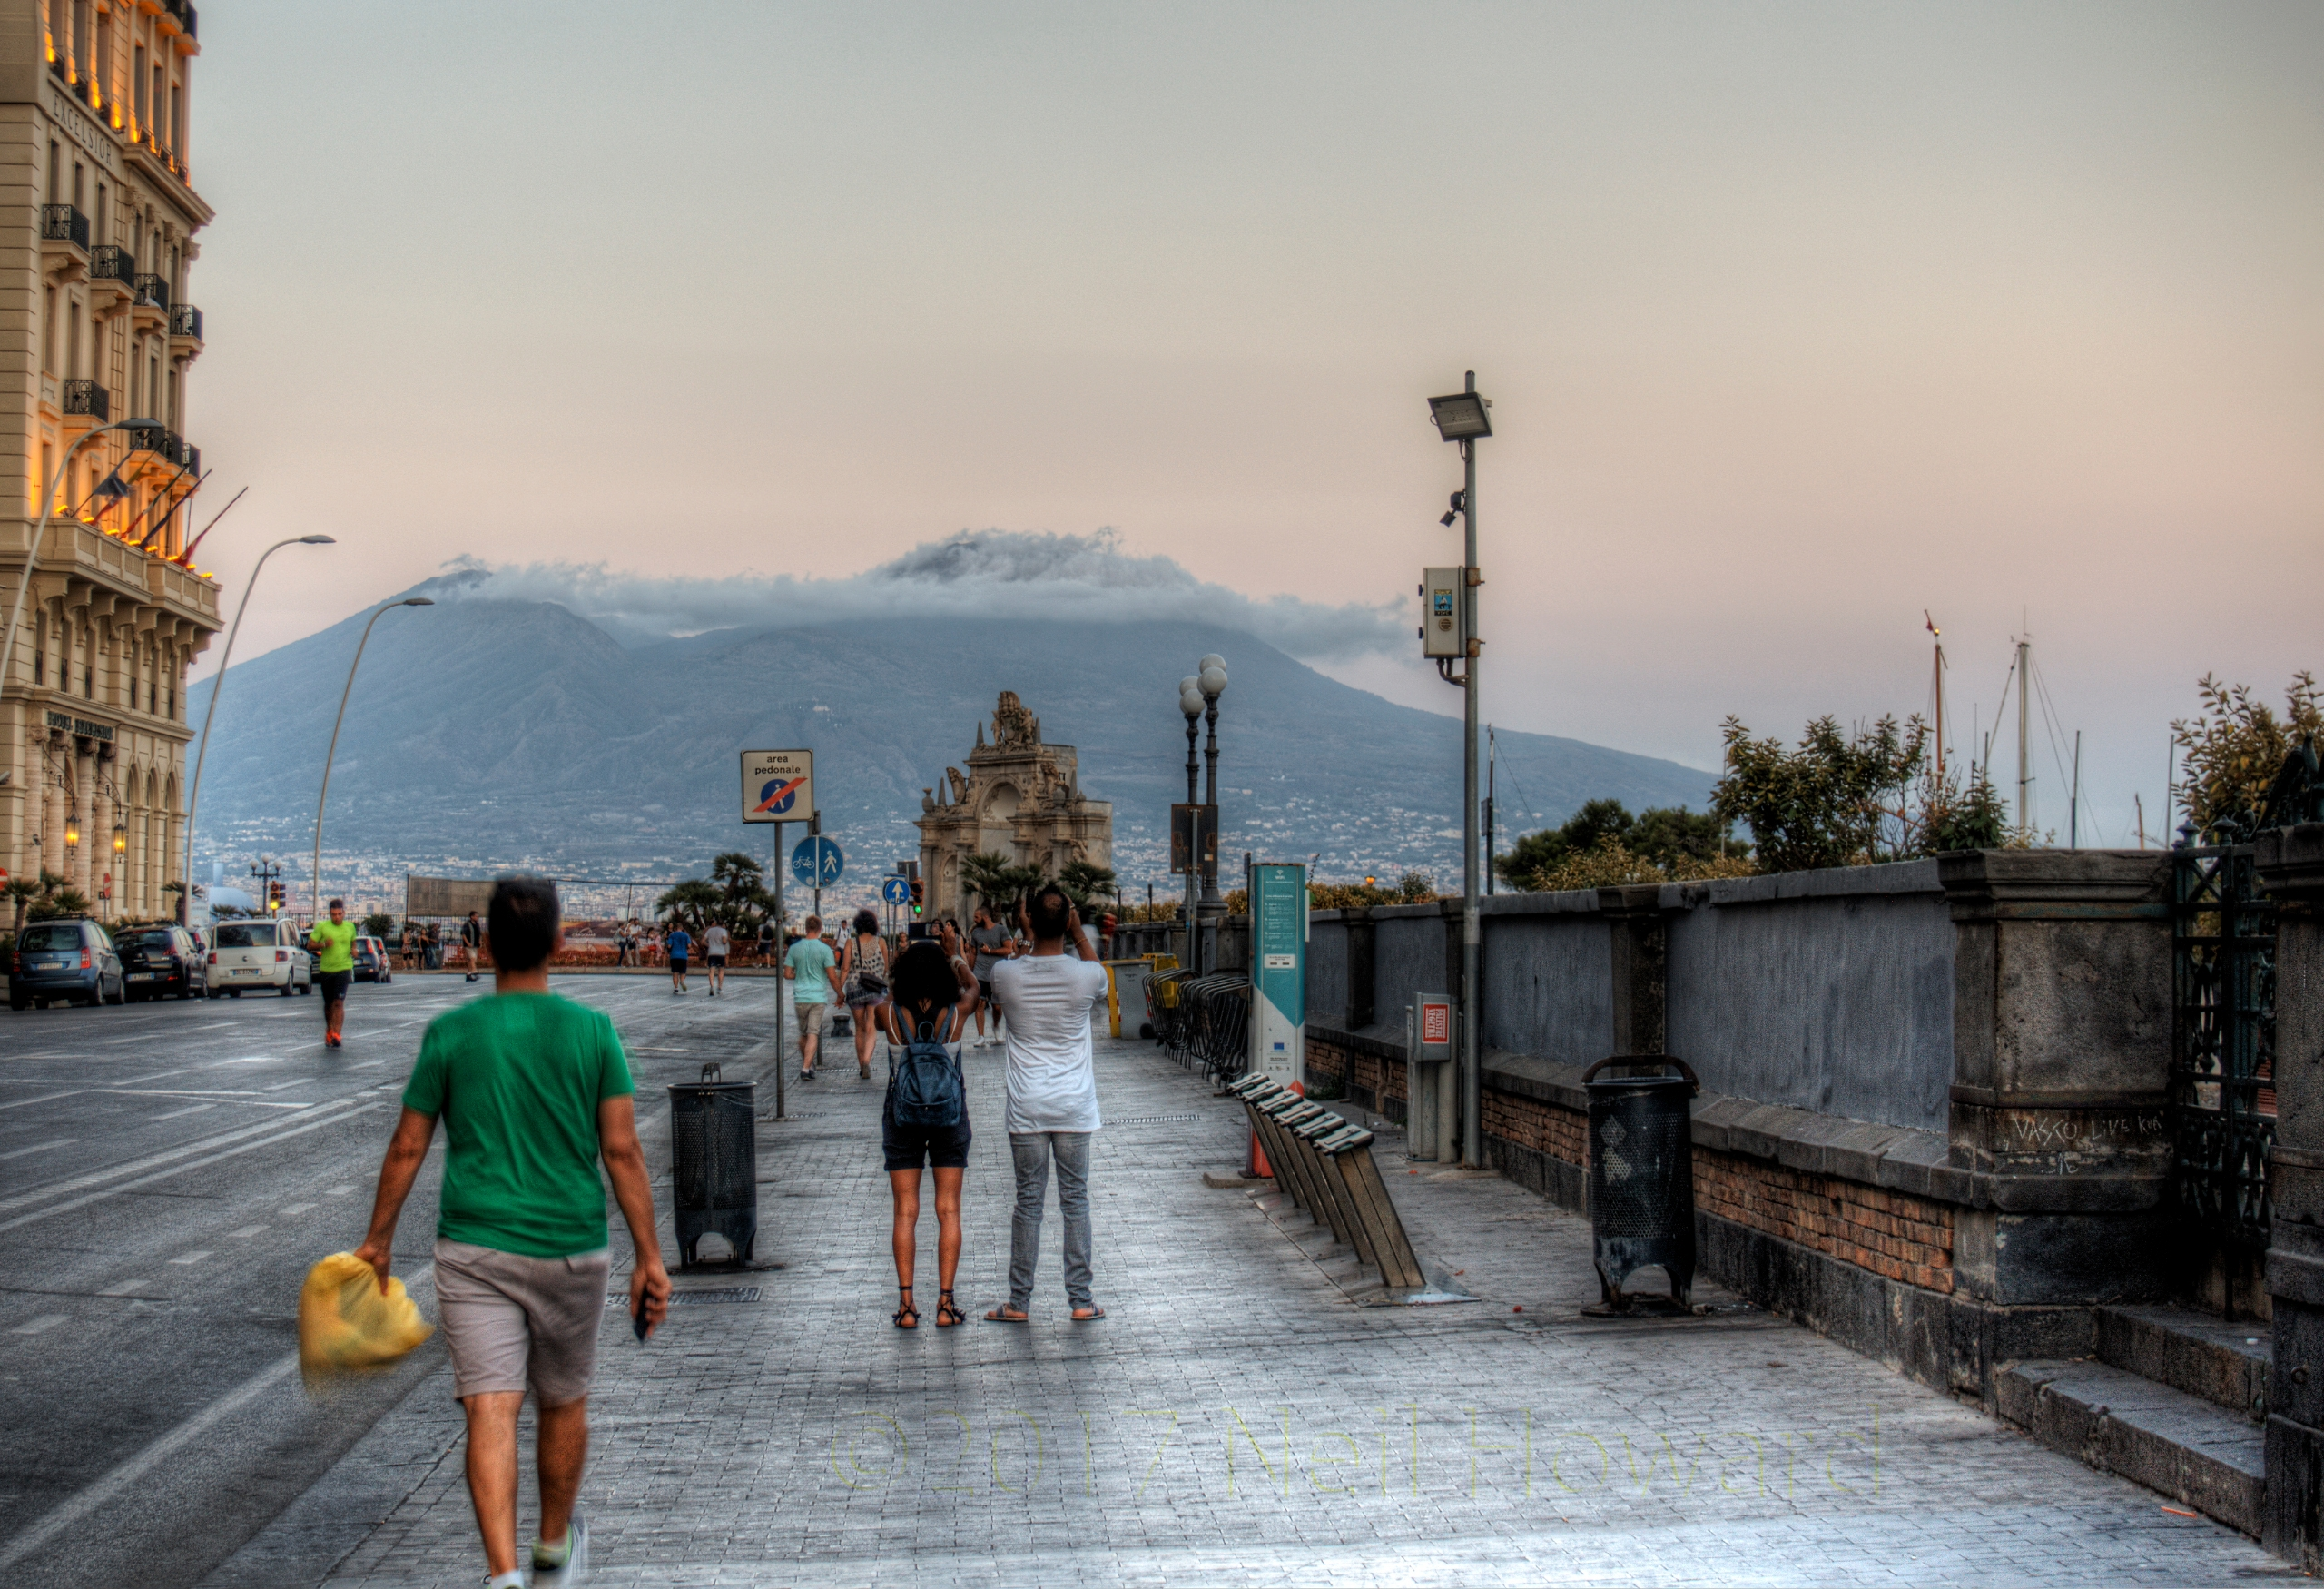 Mount Vesuvius - Clouds sit top - neilhoward   ello